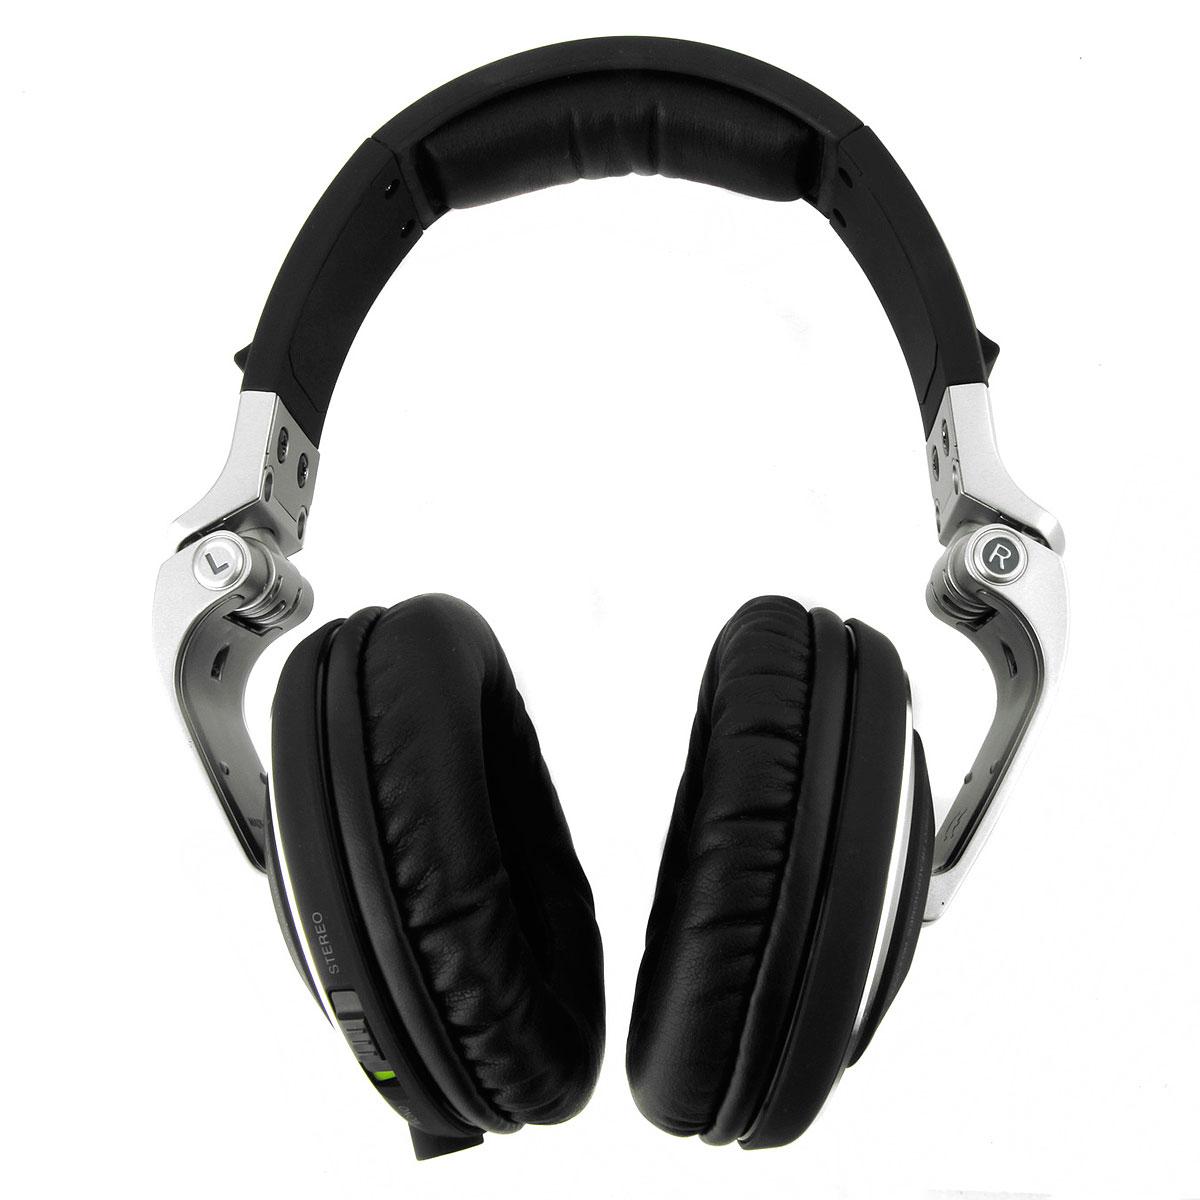 HDJ2000 - Fone de Ouvido Over-ear Prata HDJ 2000 - Pioneer